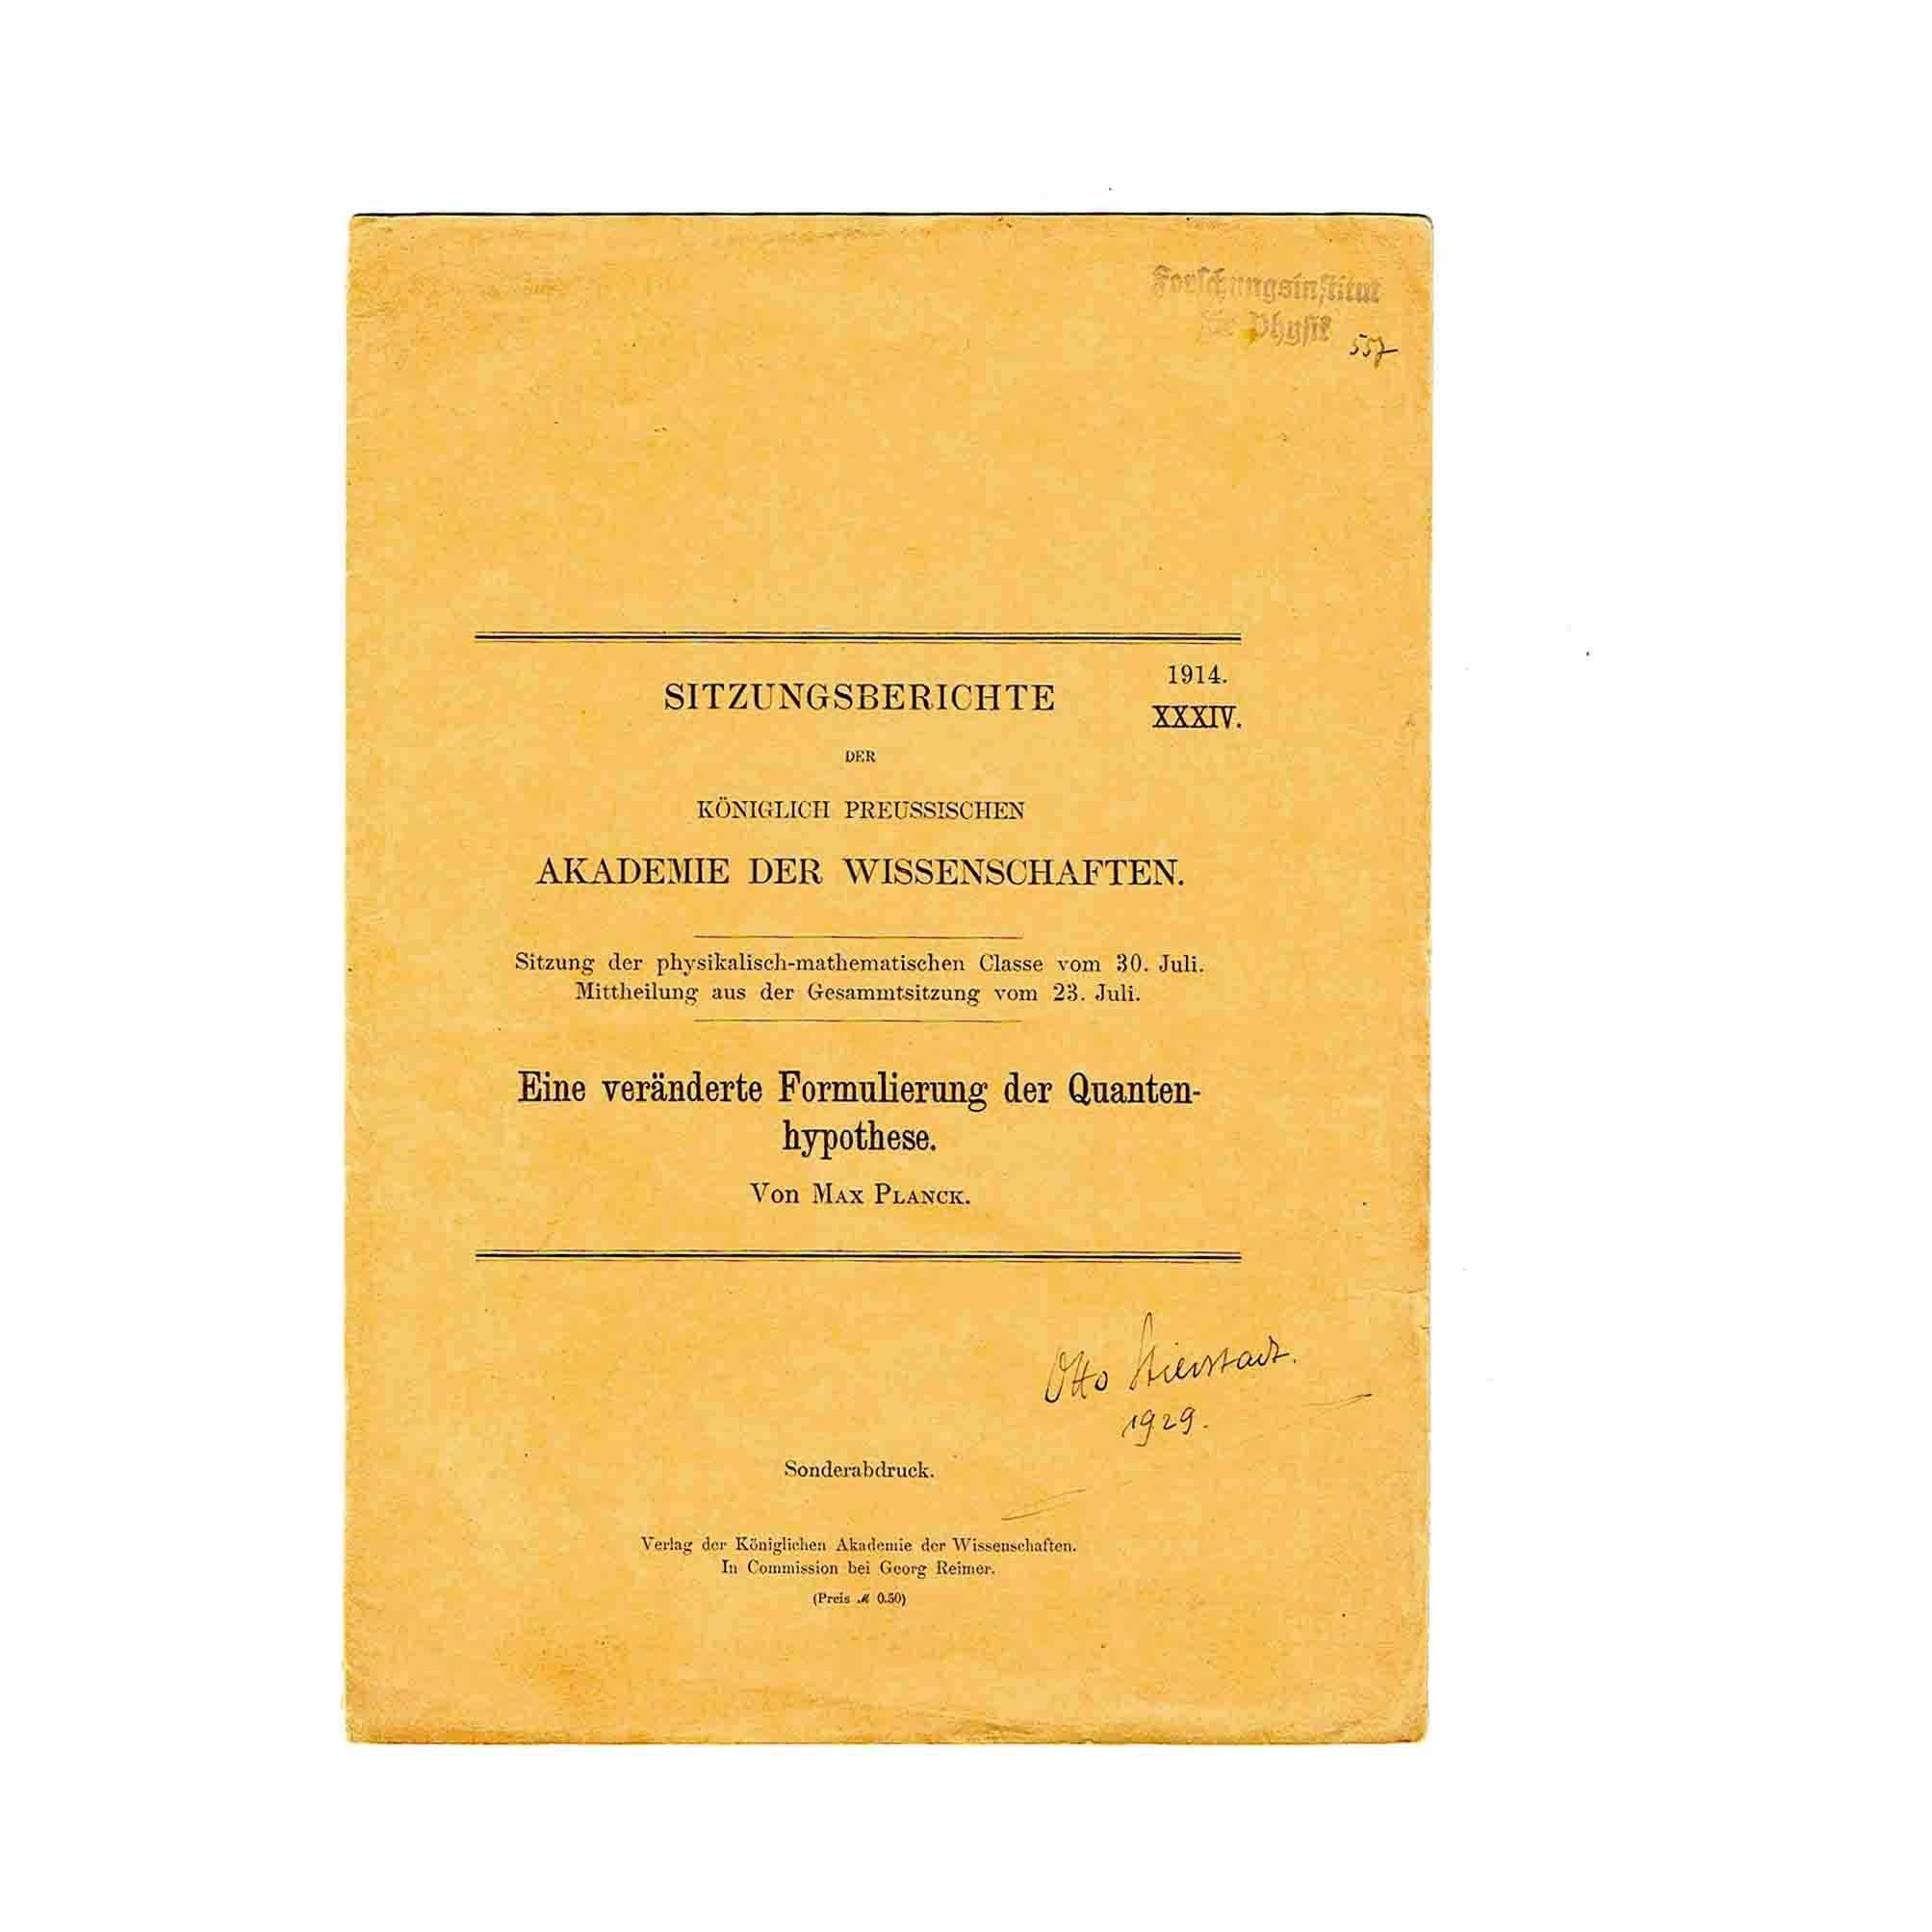 5817-Planck-Veraendert-Quantenhypothese-Offprint-1914-Umschlag-recto-free-N.jpeg